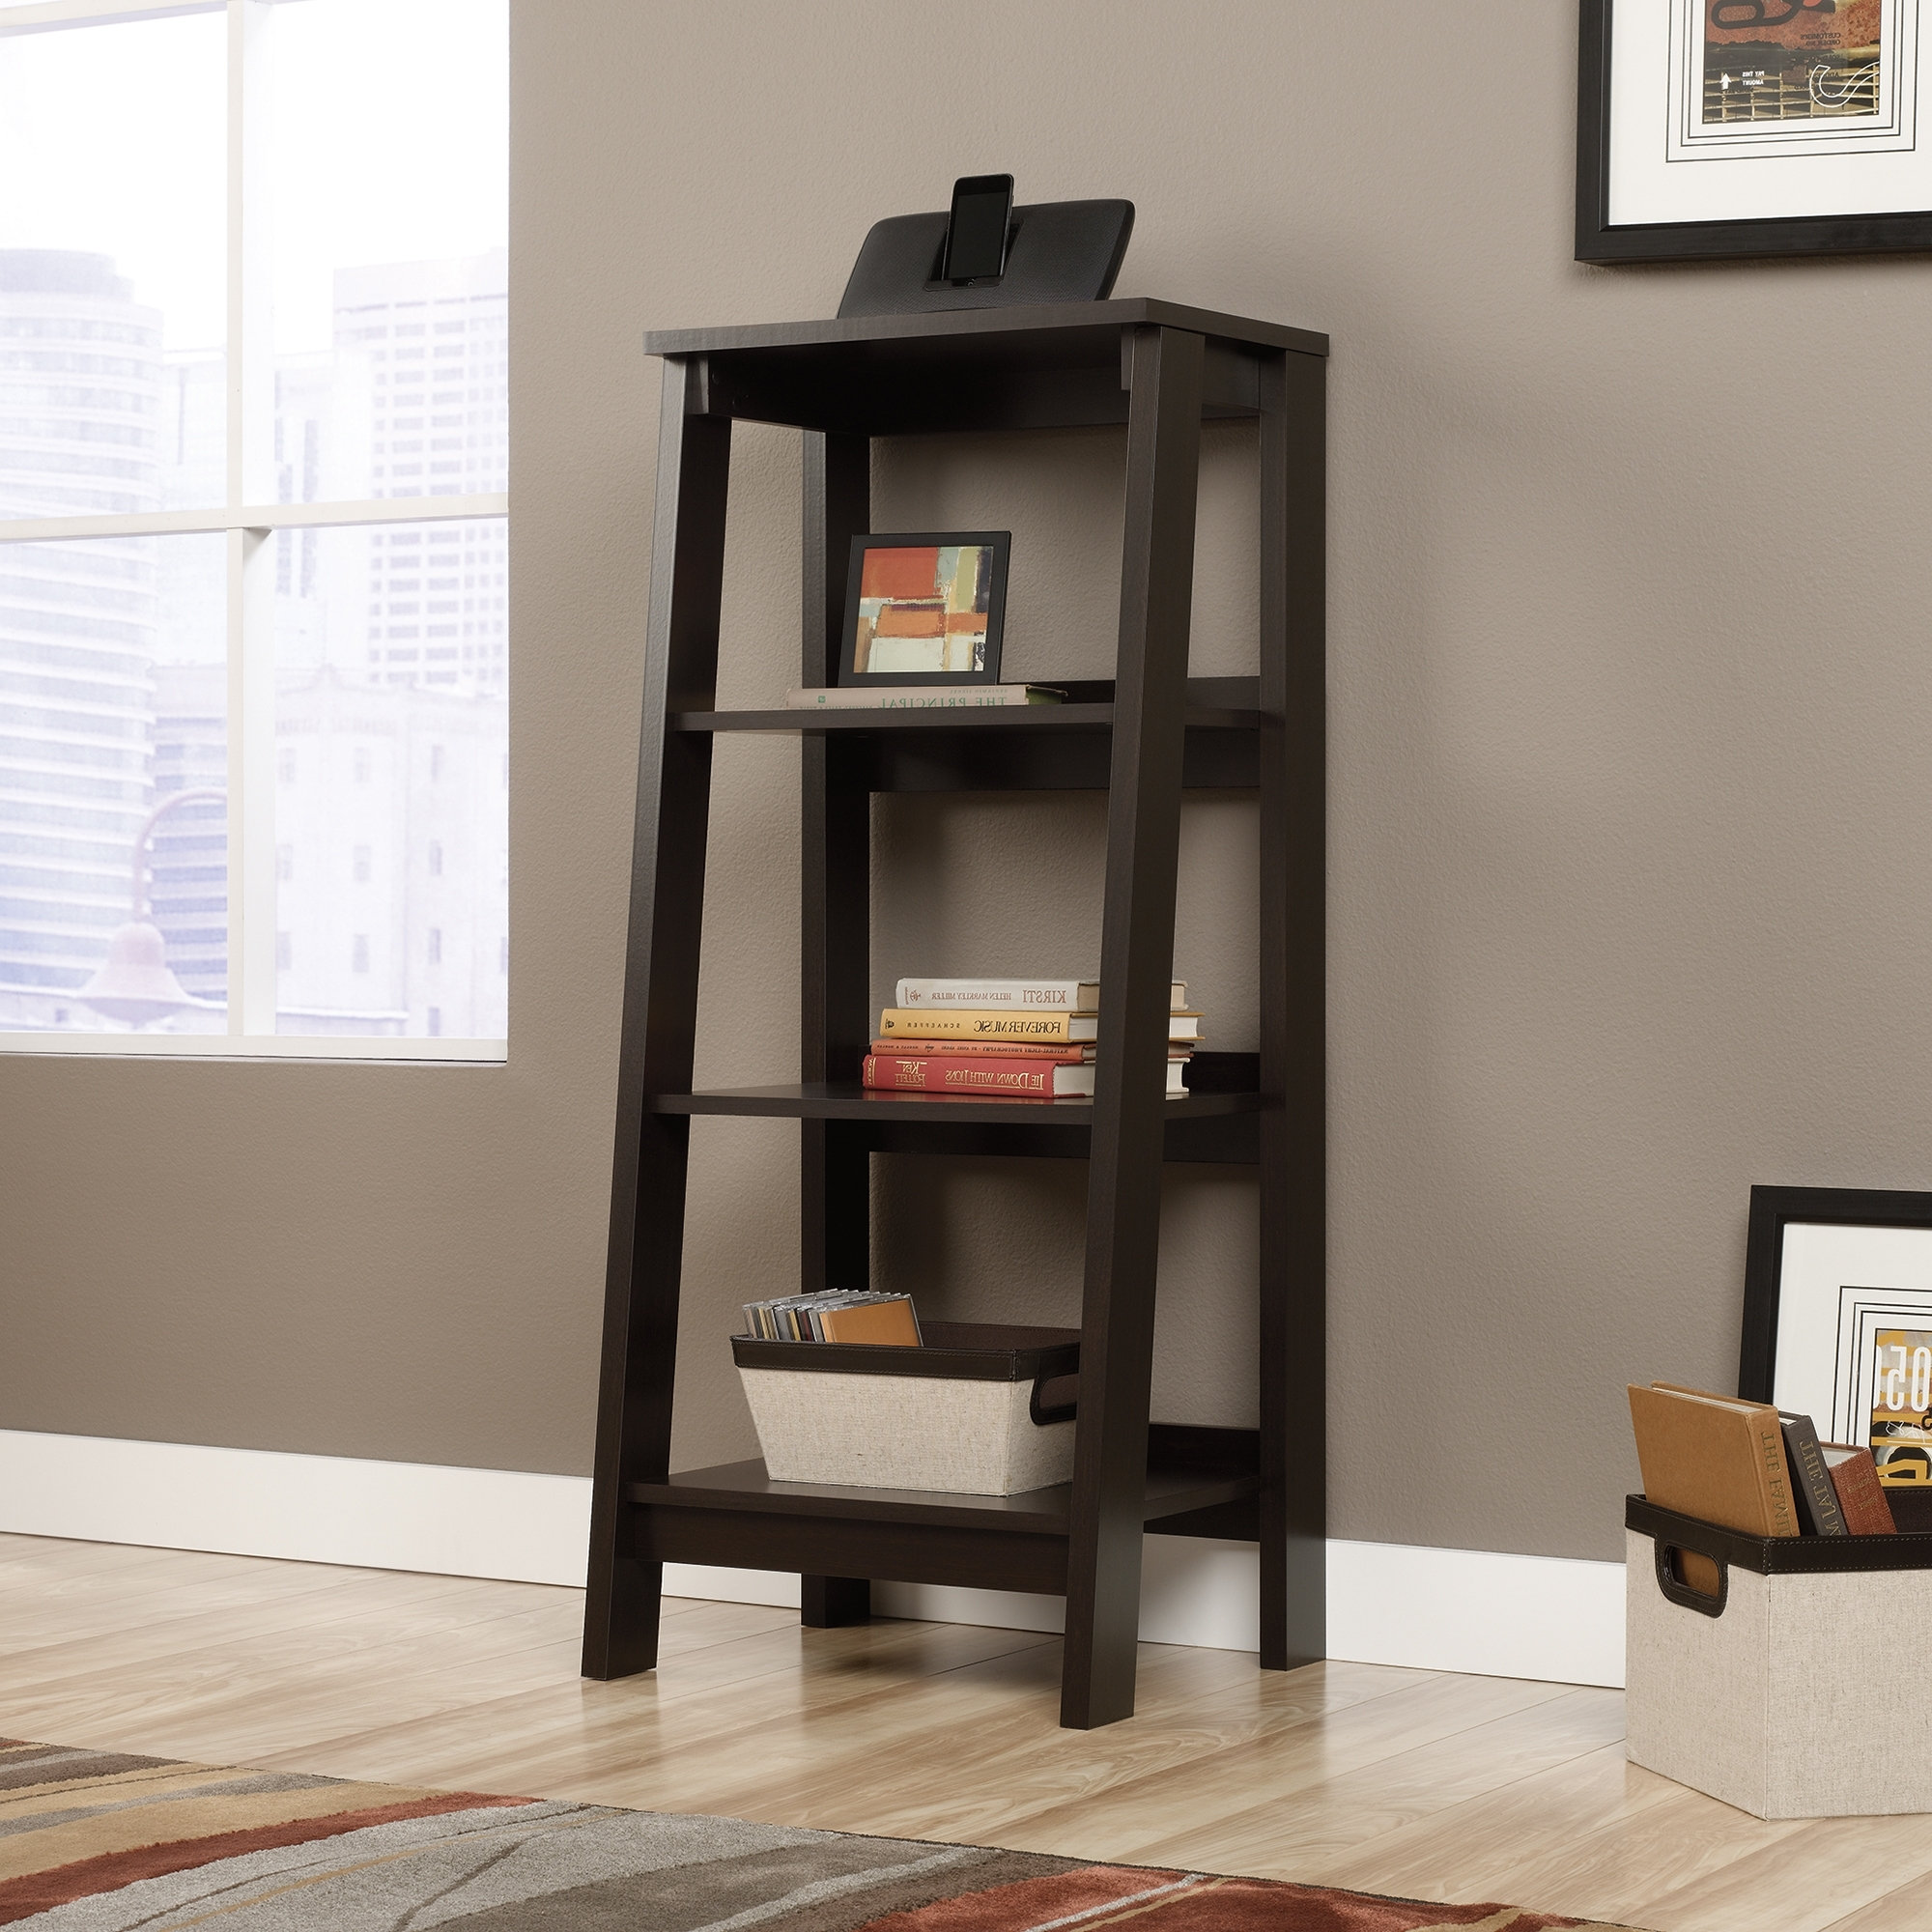 5 Shelf Bookcase (View 13 of 15)